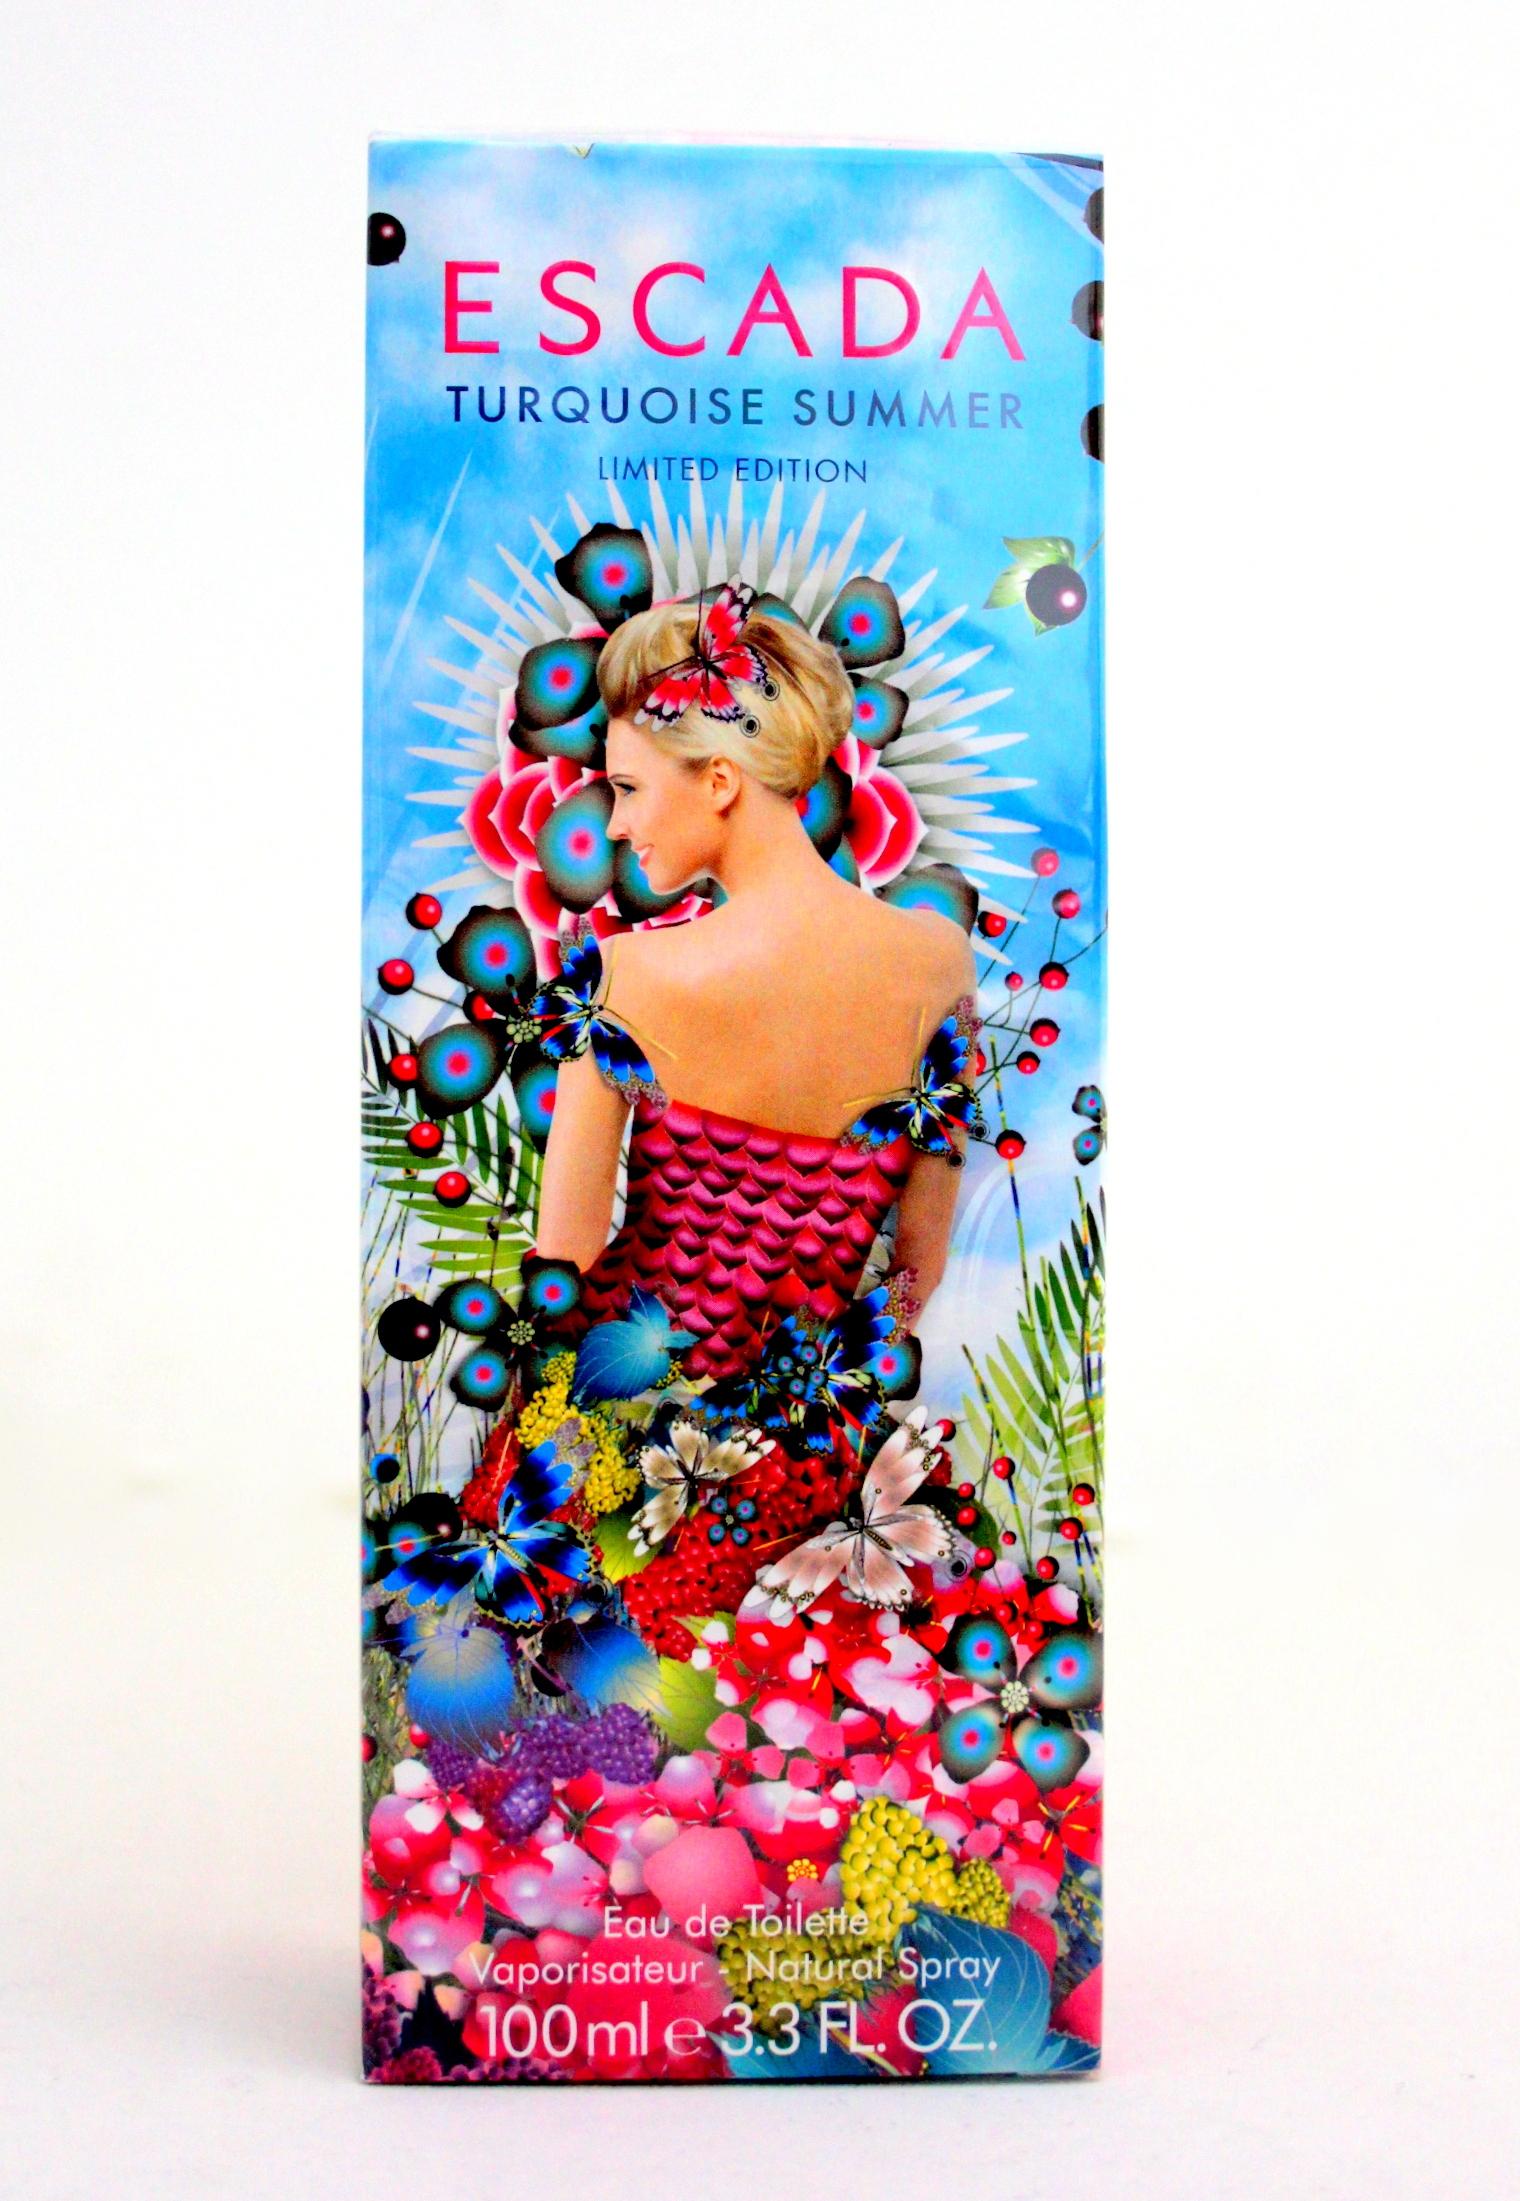 Escada Turquoise Summer Eau de Toilette